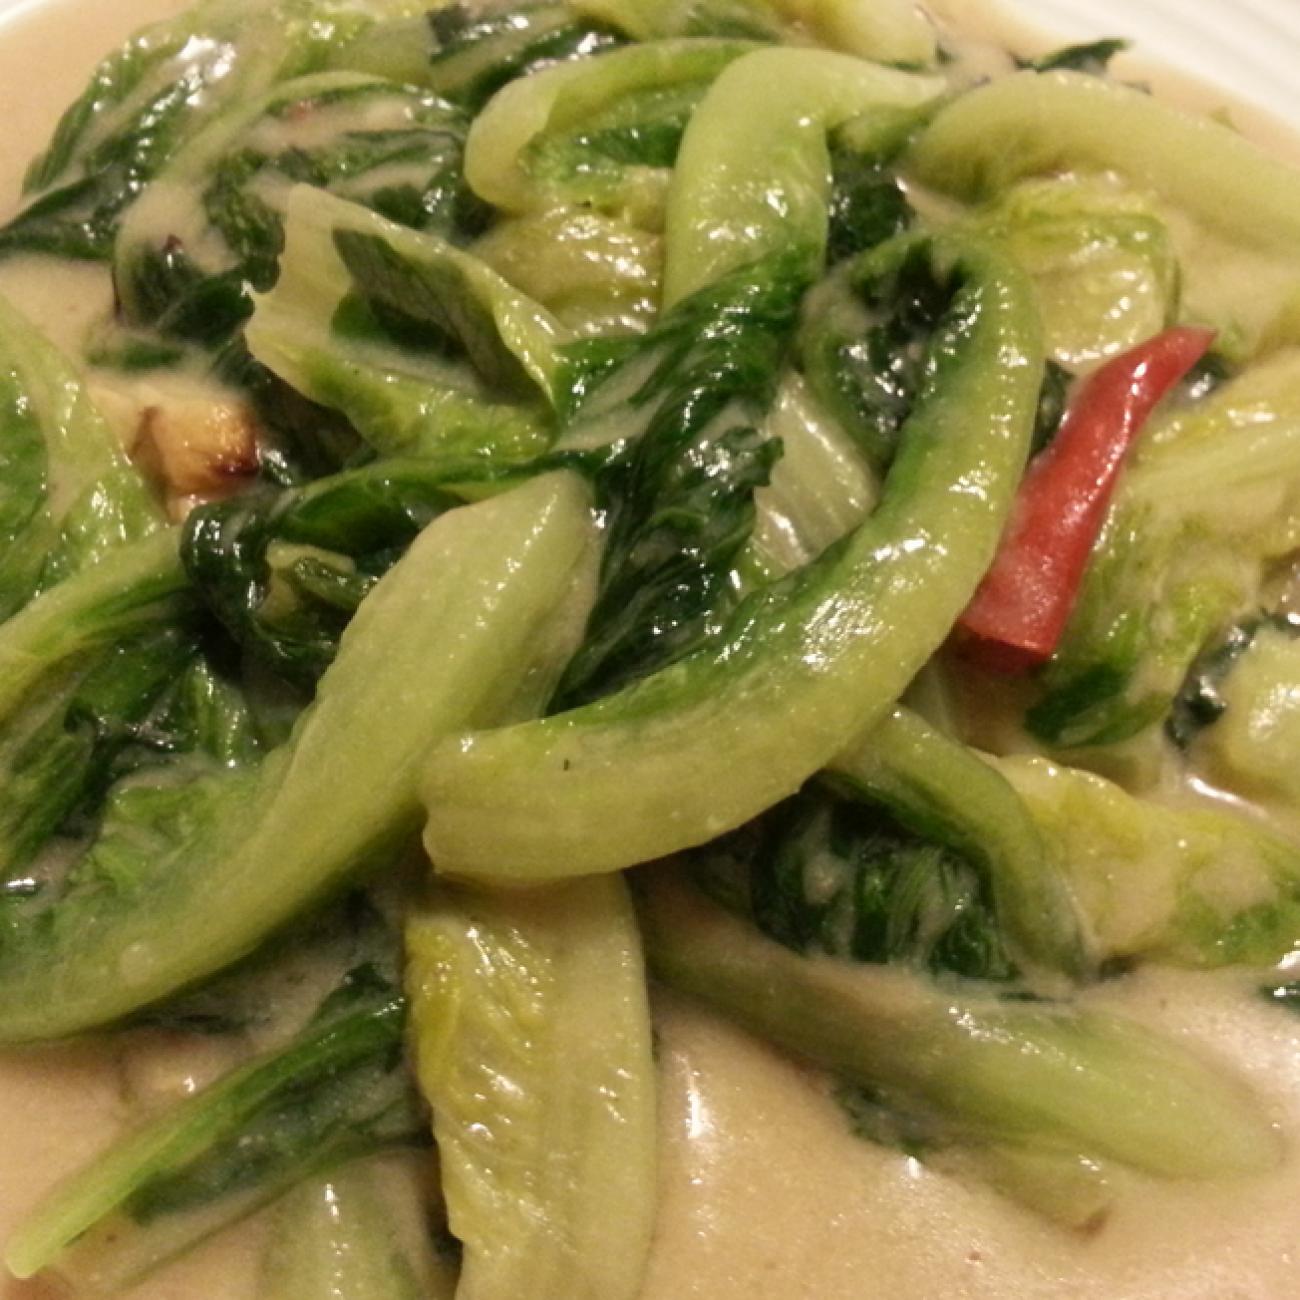 Lettuce with Fermented Tofu (Fu Yu Yau Mak 腐乳油麥)